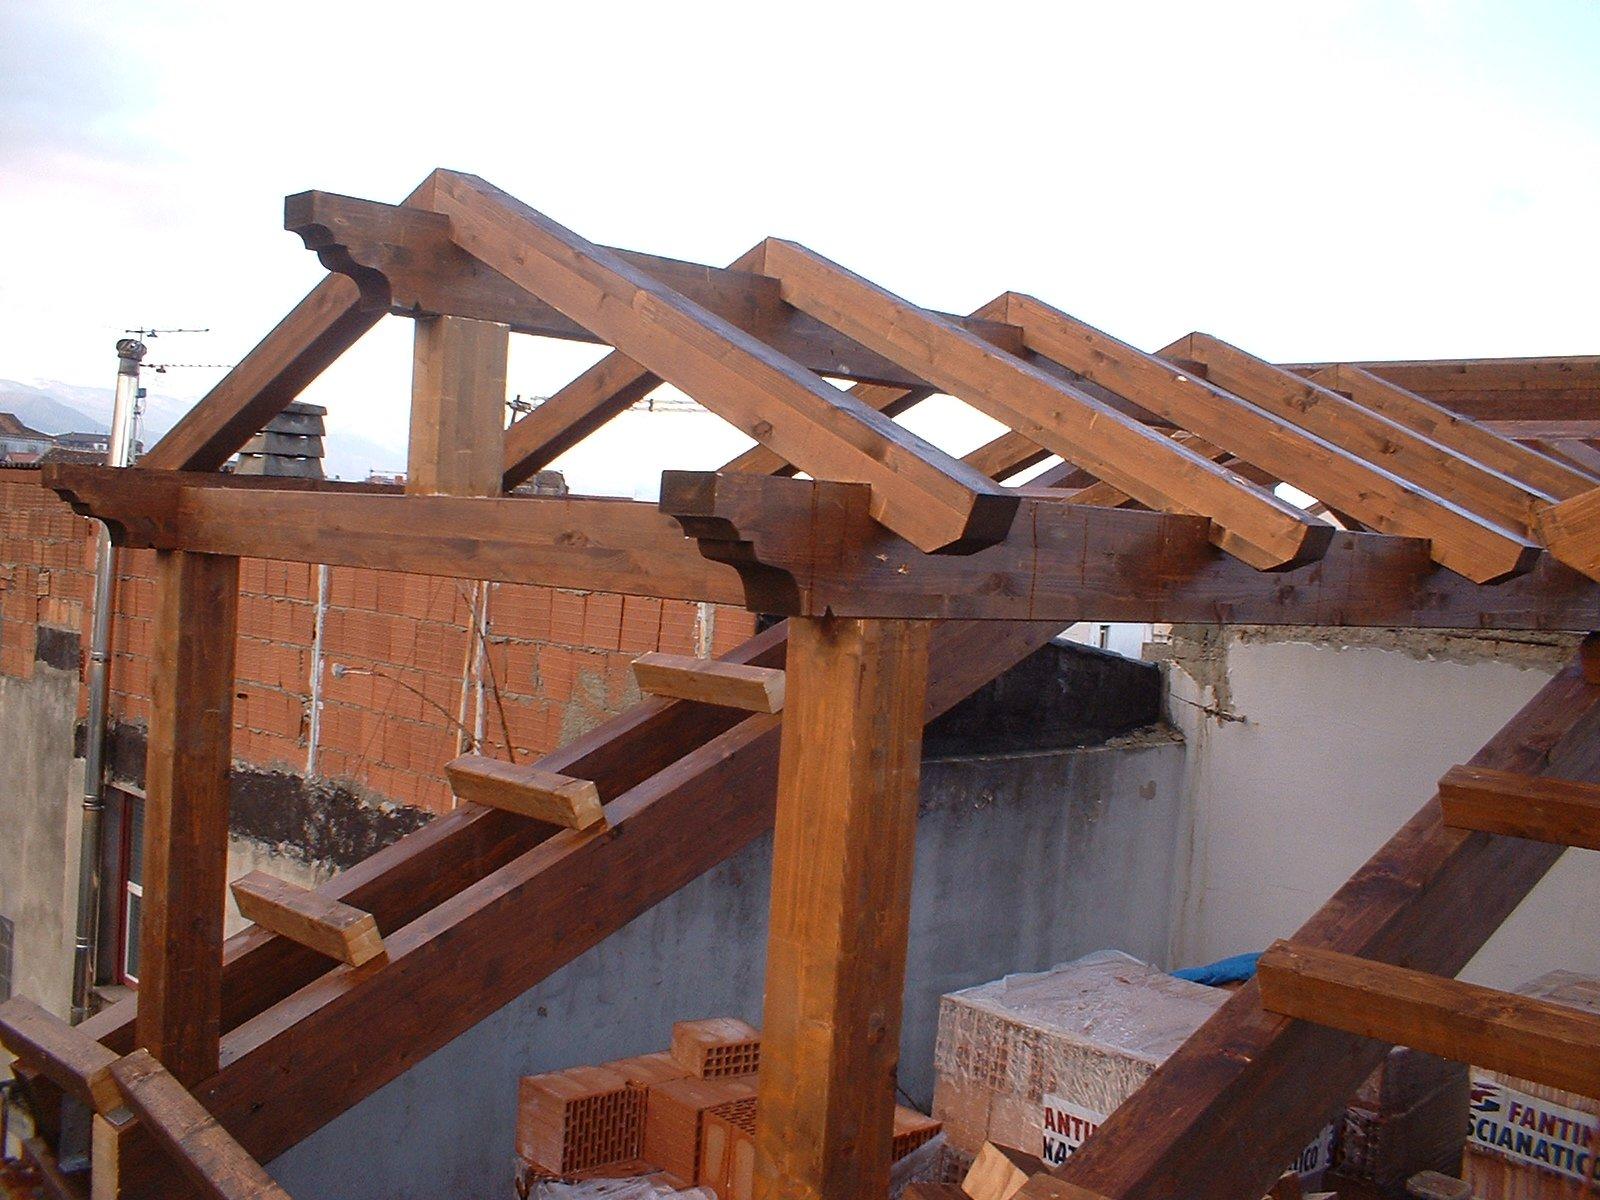 Tettoie in legno coperture prefabbricati in legno for Immagini di tettoie in legno